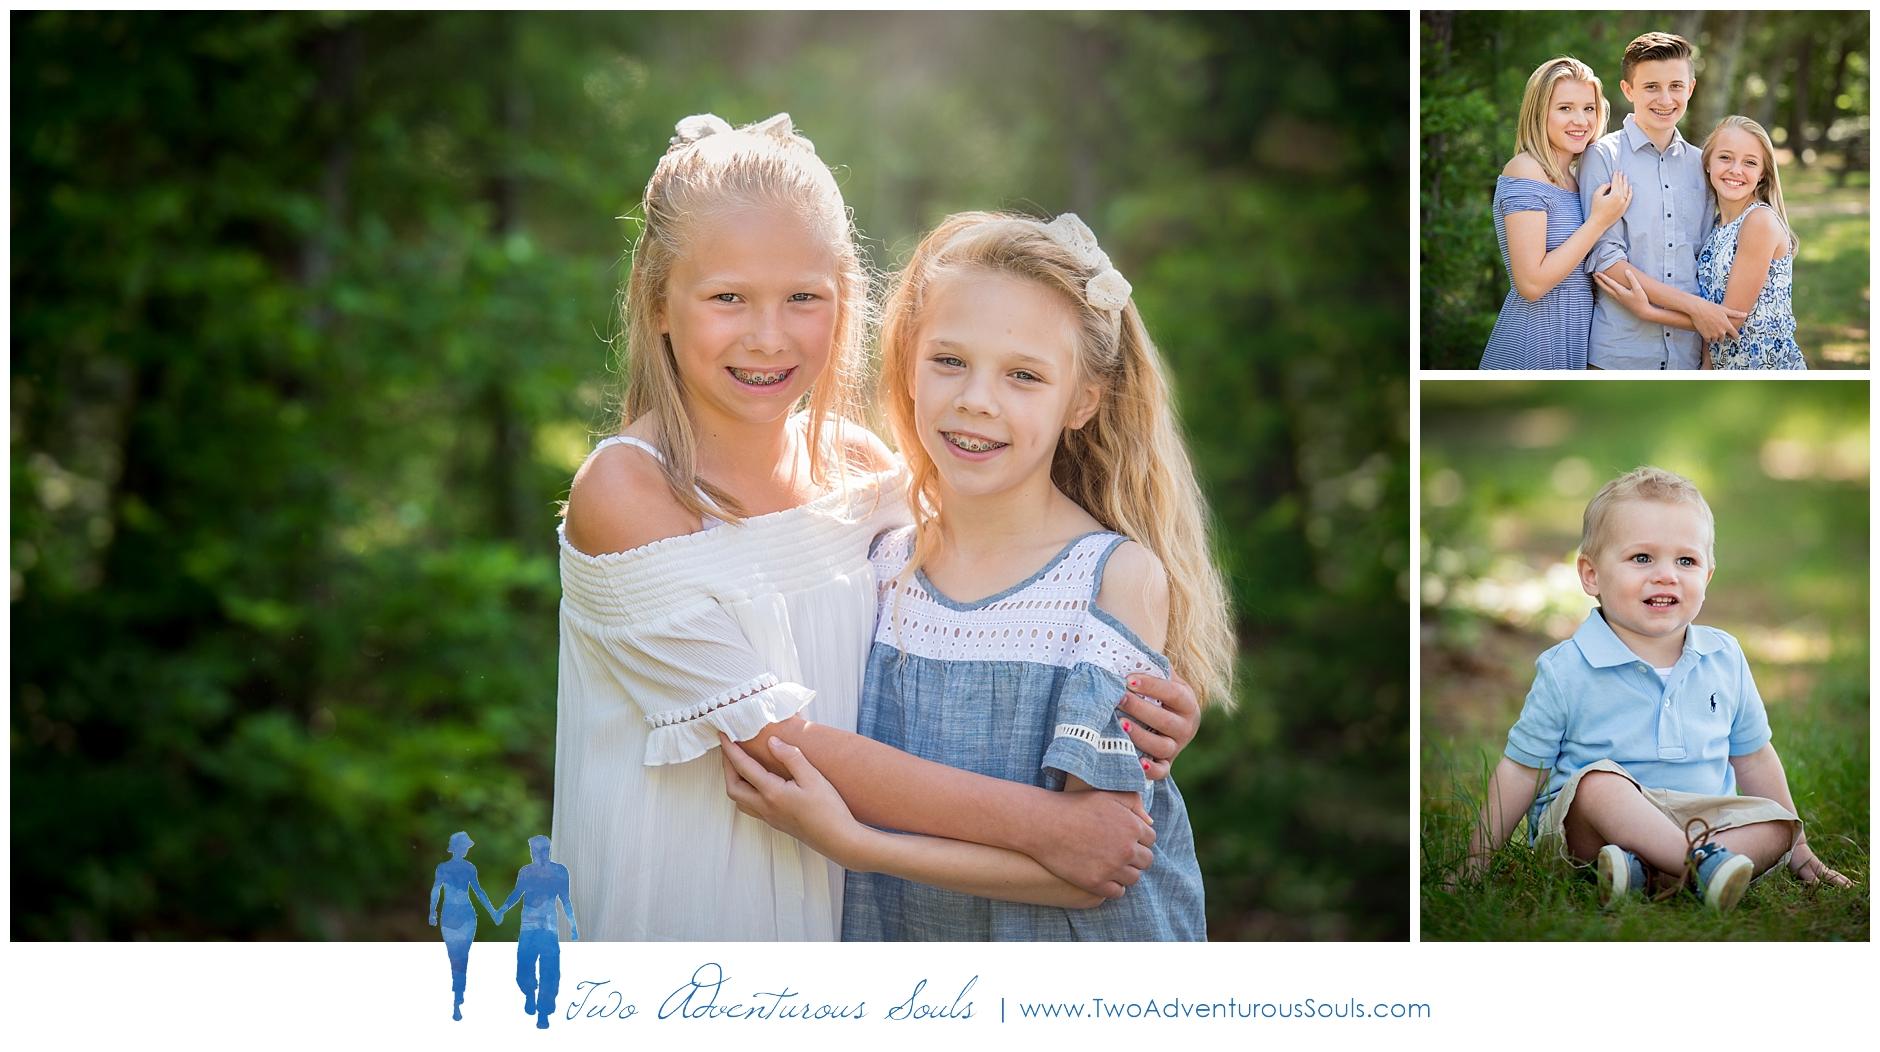 Sebago Lake Family Portraits, Sebago Maine Photographer - Childrens Portraiture